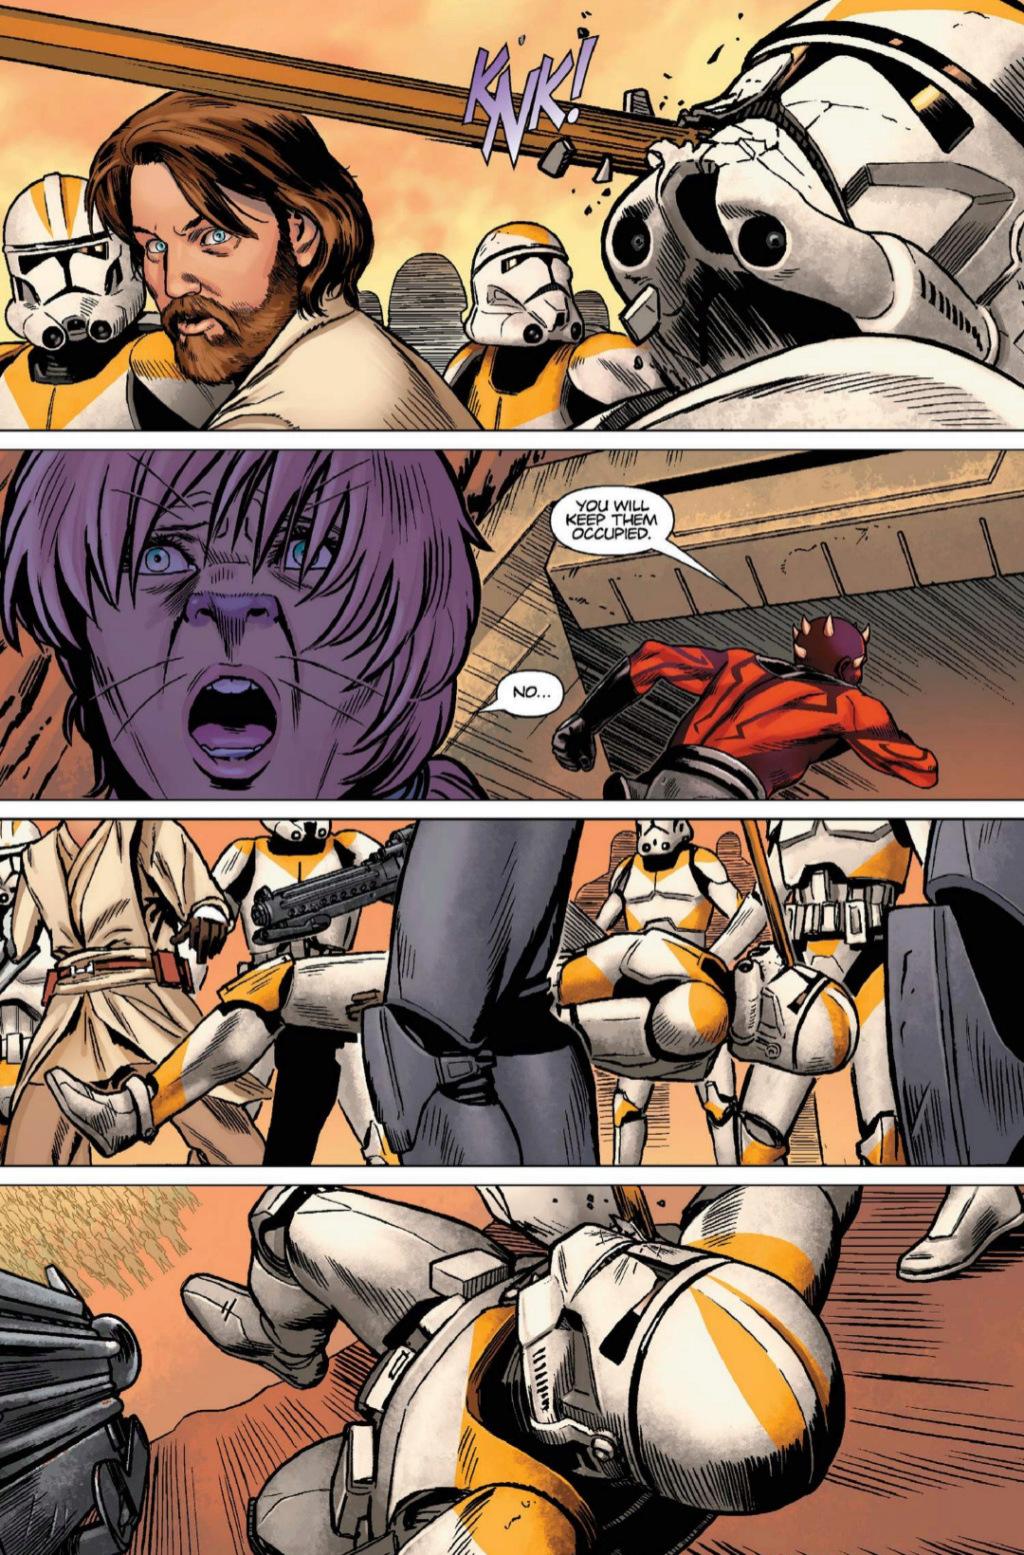 SS - The Tyrannical Ten - Arcann (xSupremeSkillz) vs Darth Maul (ILS) Speart11